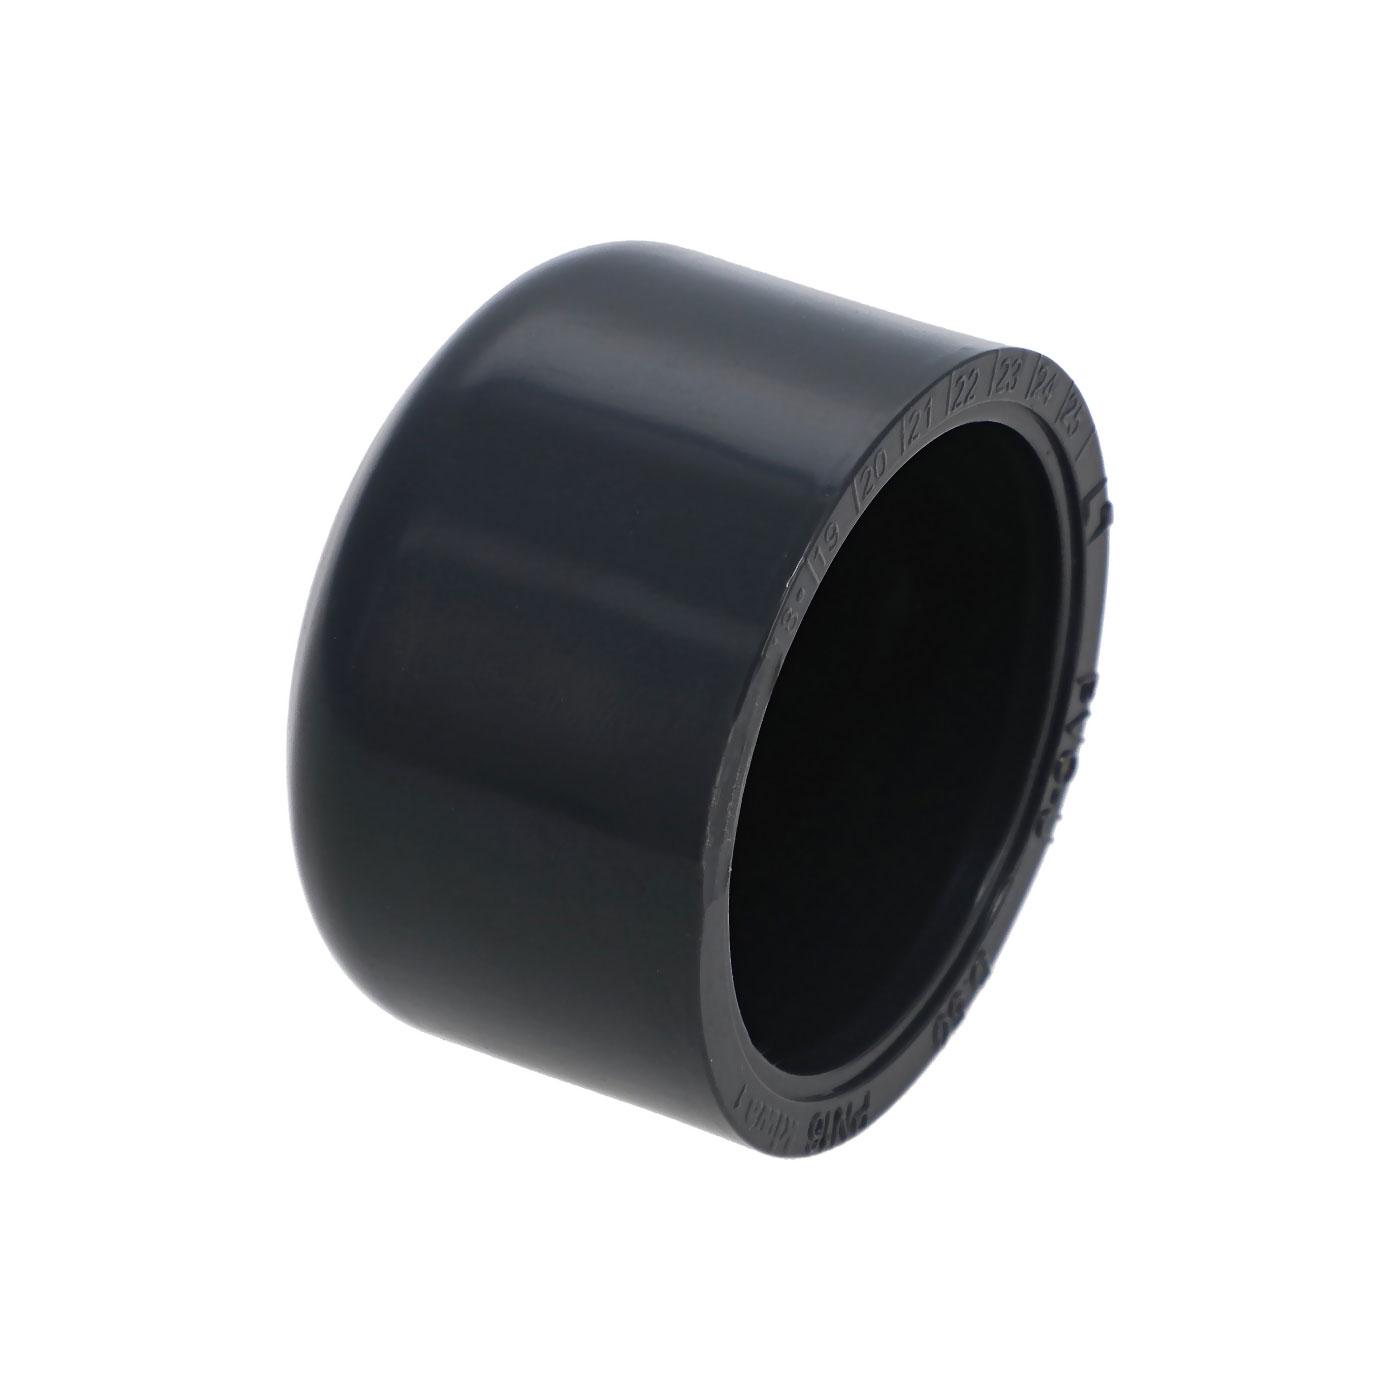 50mm M Pipe / Manifold Cap